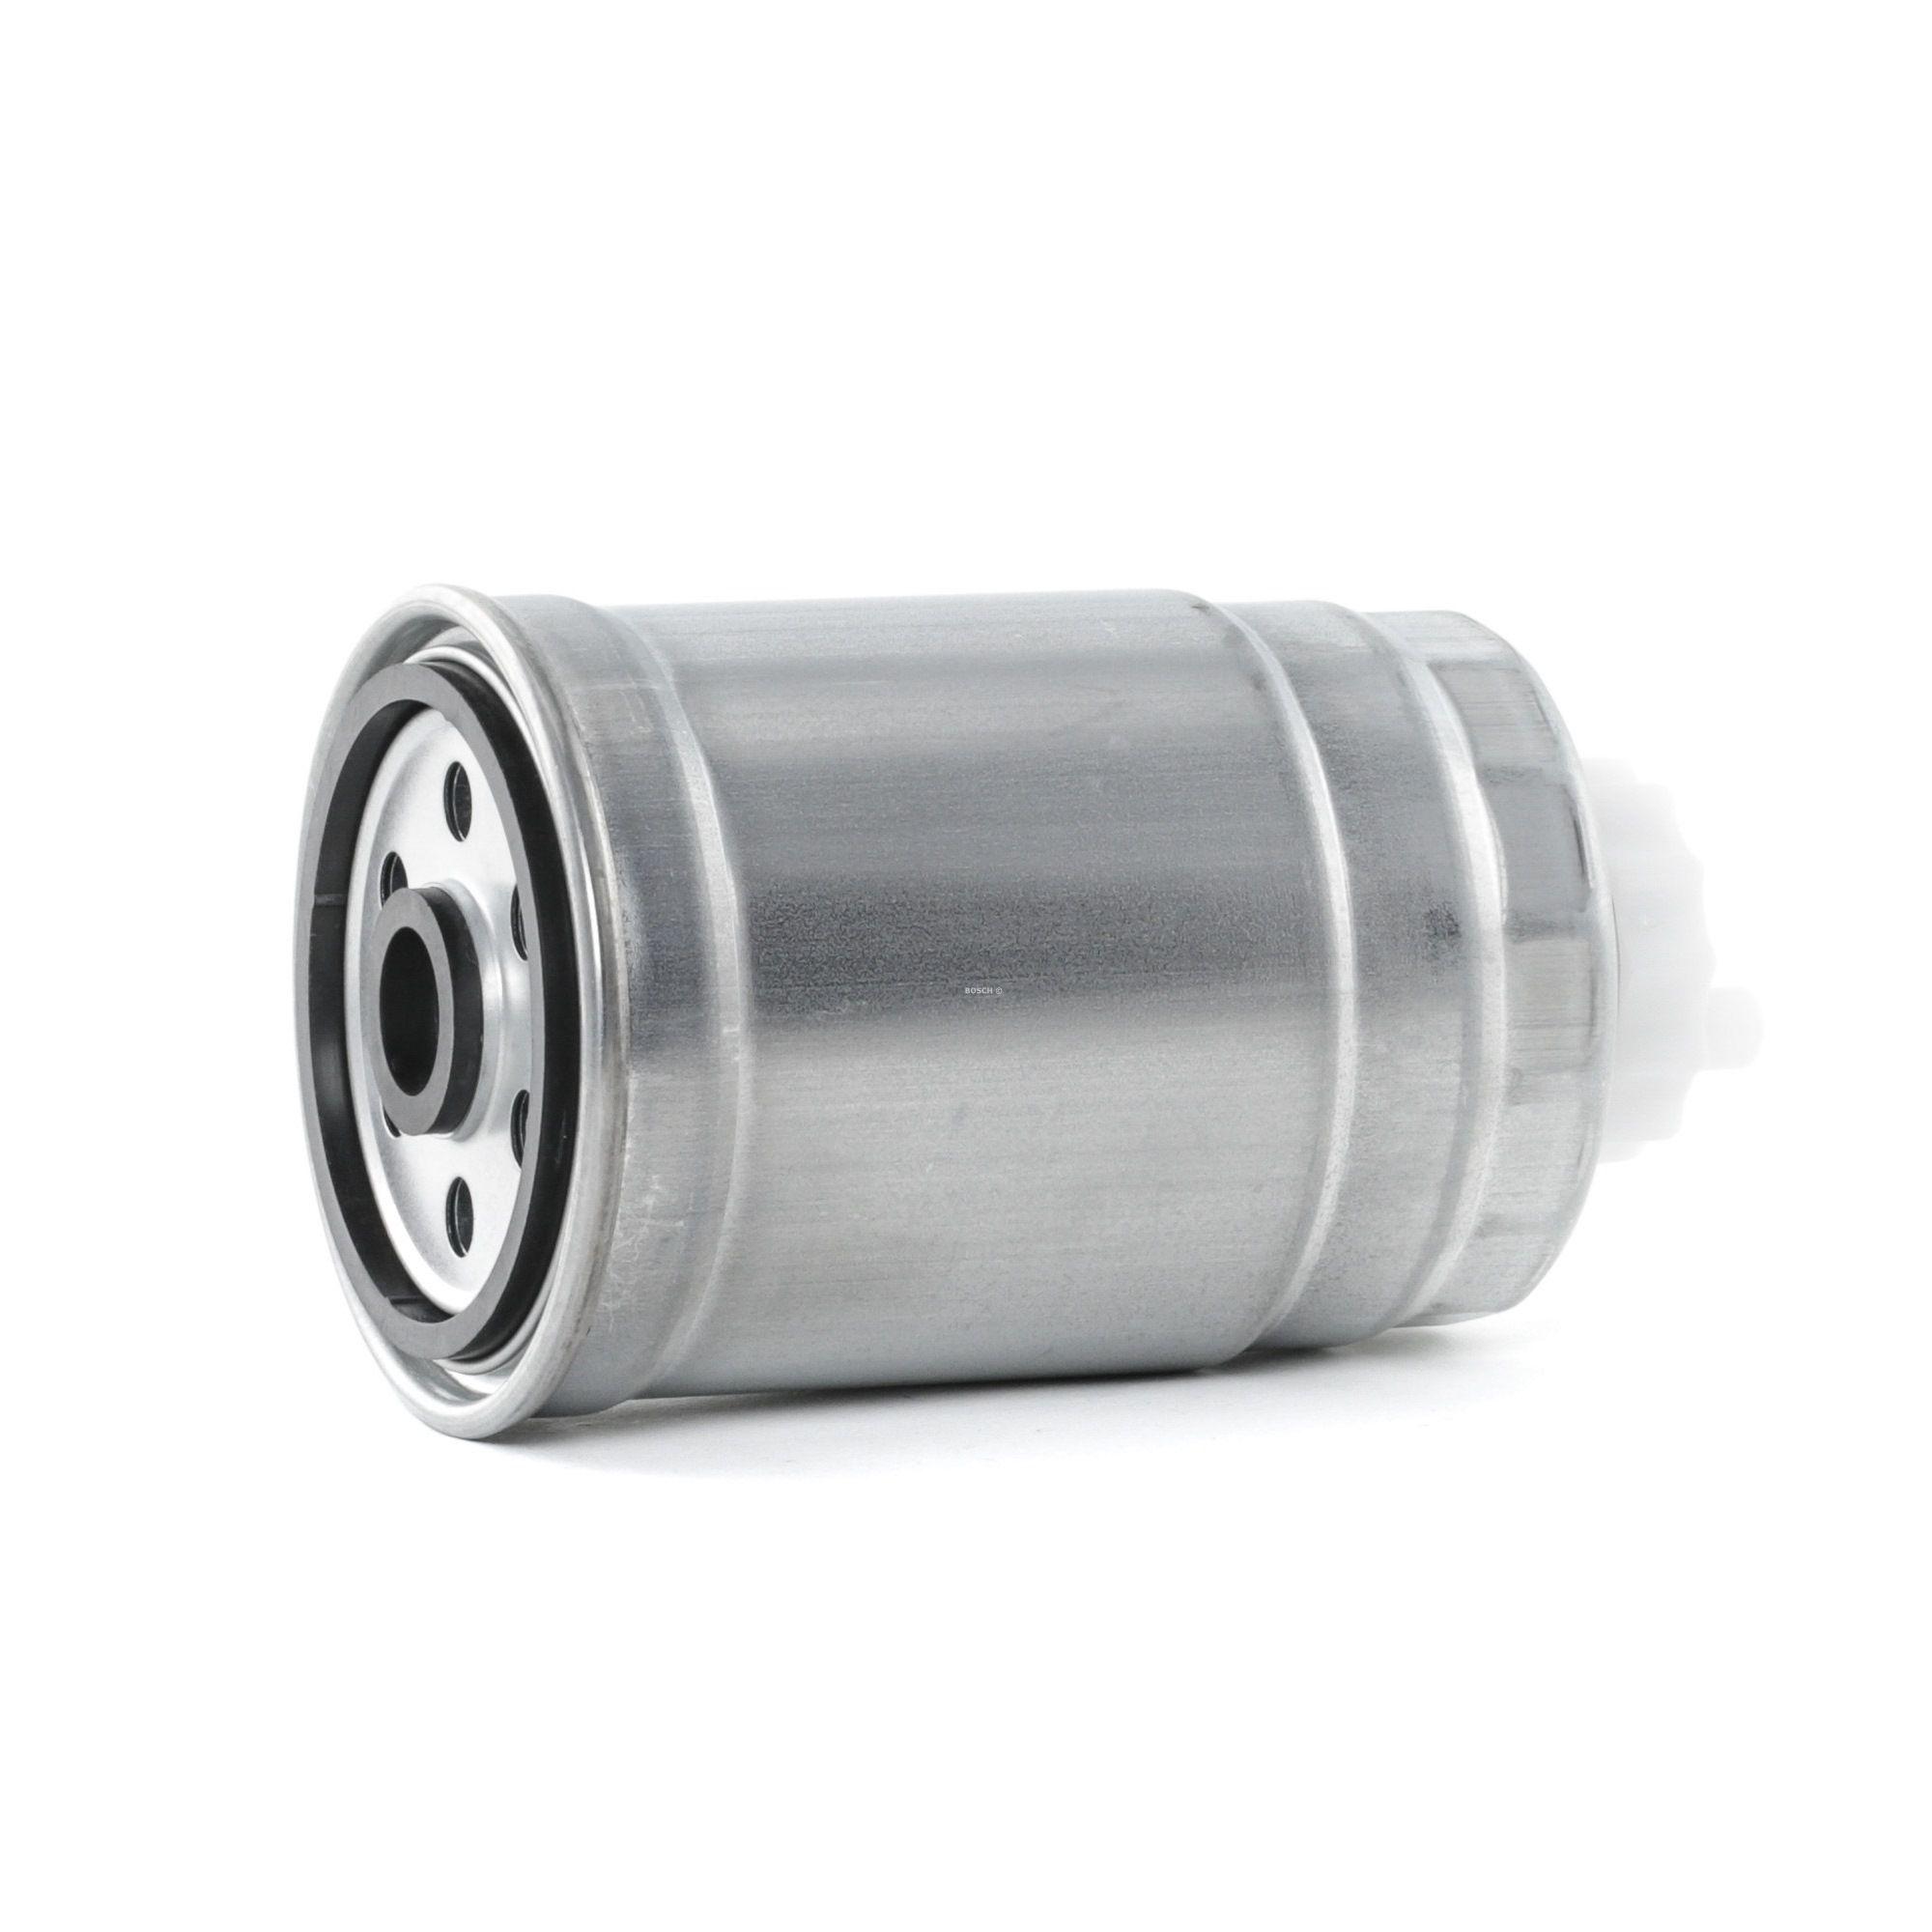 CHRYSLER Filtre à carburant d'Origine F 026 402 848